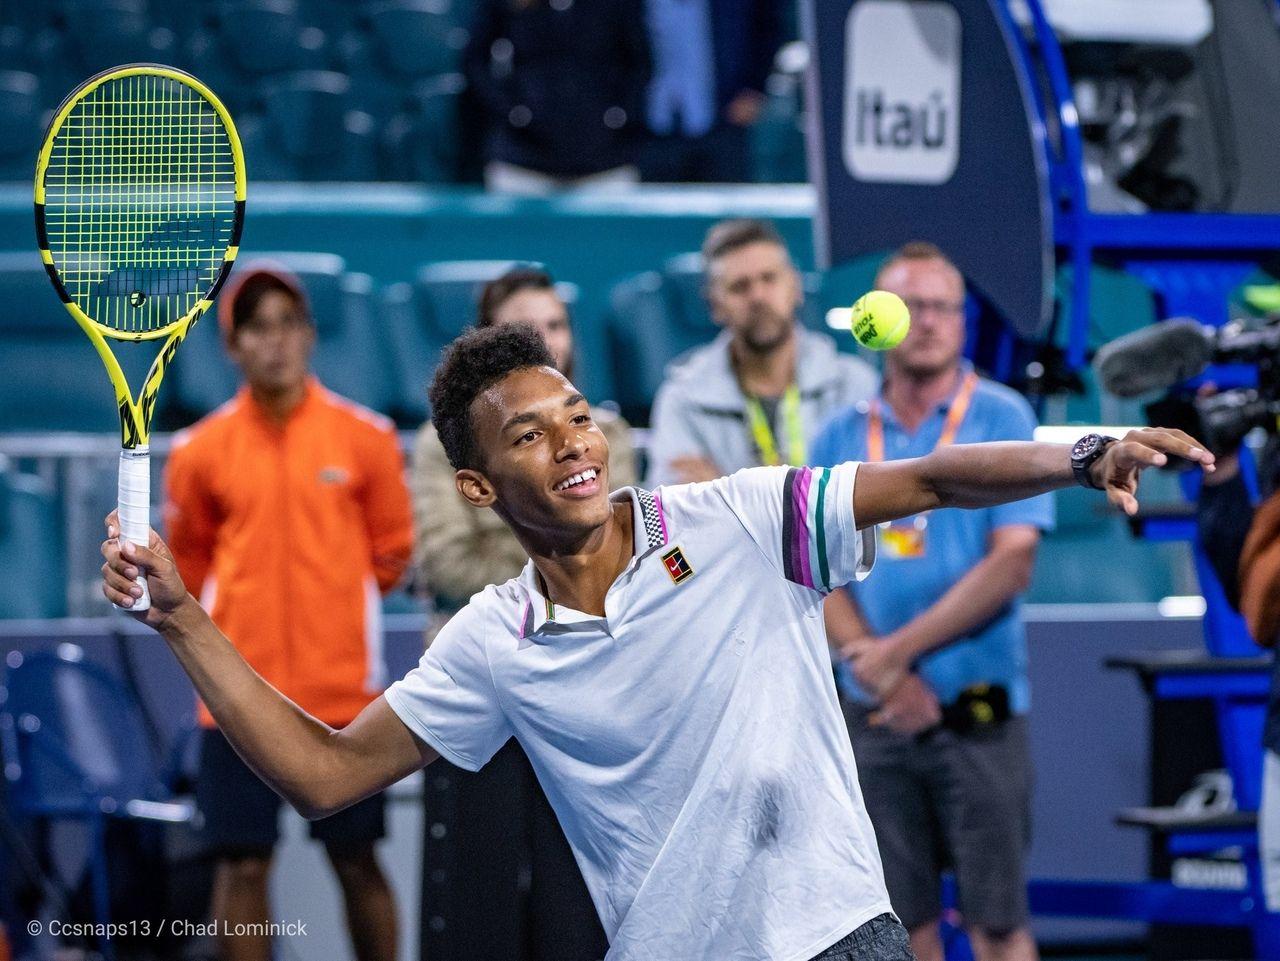 Felix Auger Aliassime In Miami Open 2019 Babolat Pure Aero New Tennis Racket Tennis Player Tennis Court Photo Shoot Tennis Tennis Racket Best Tennis Rackets